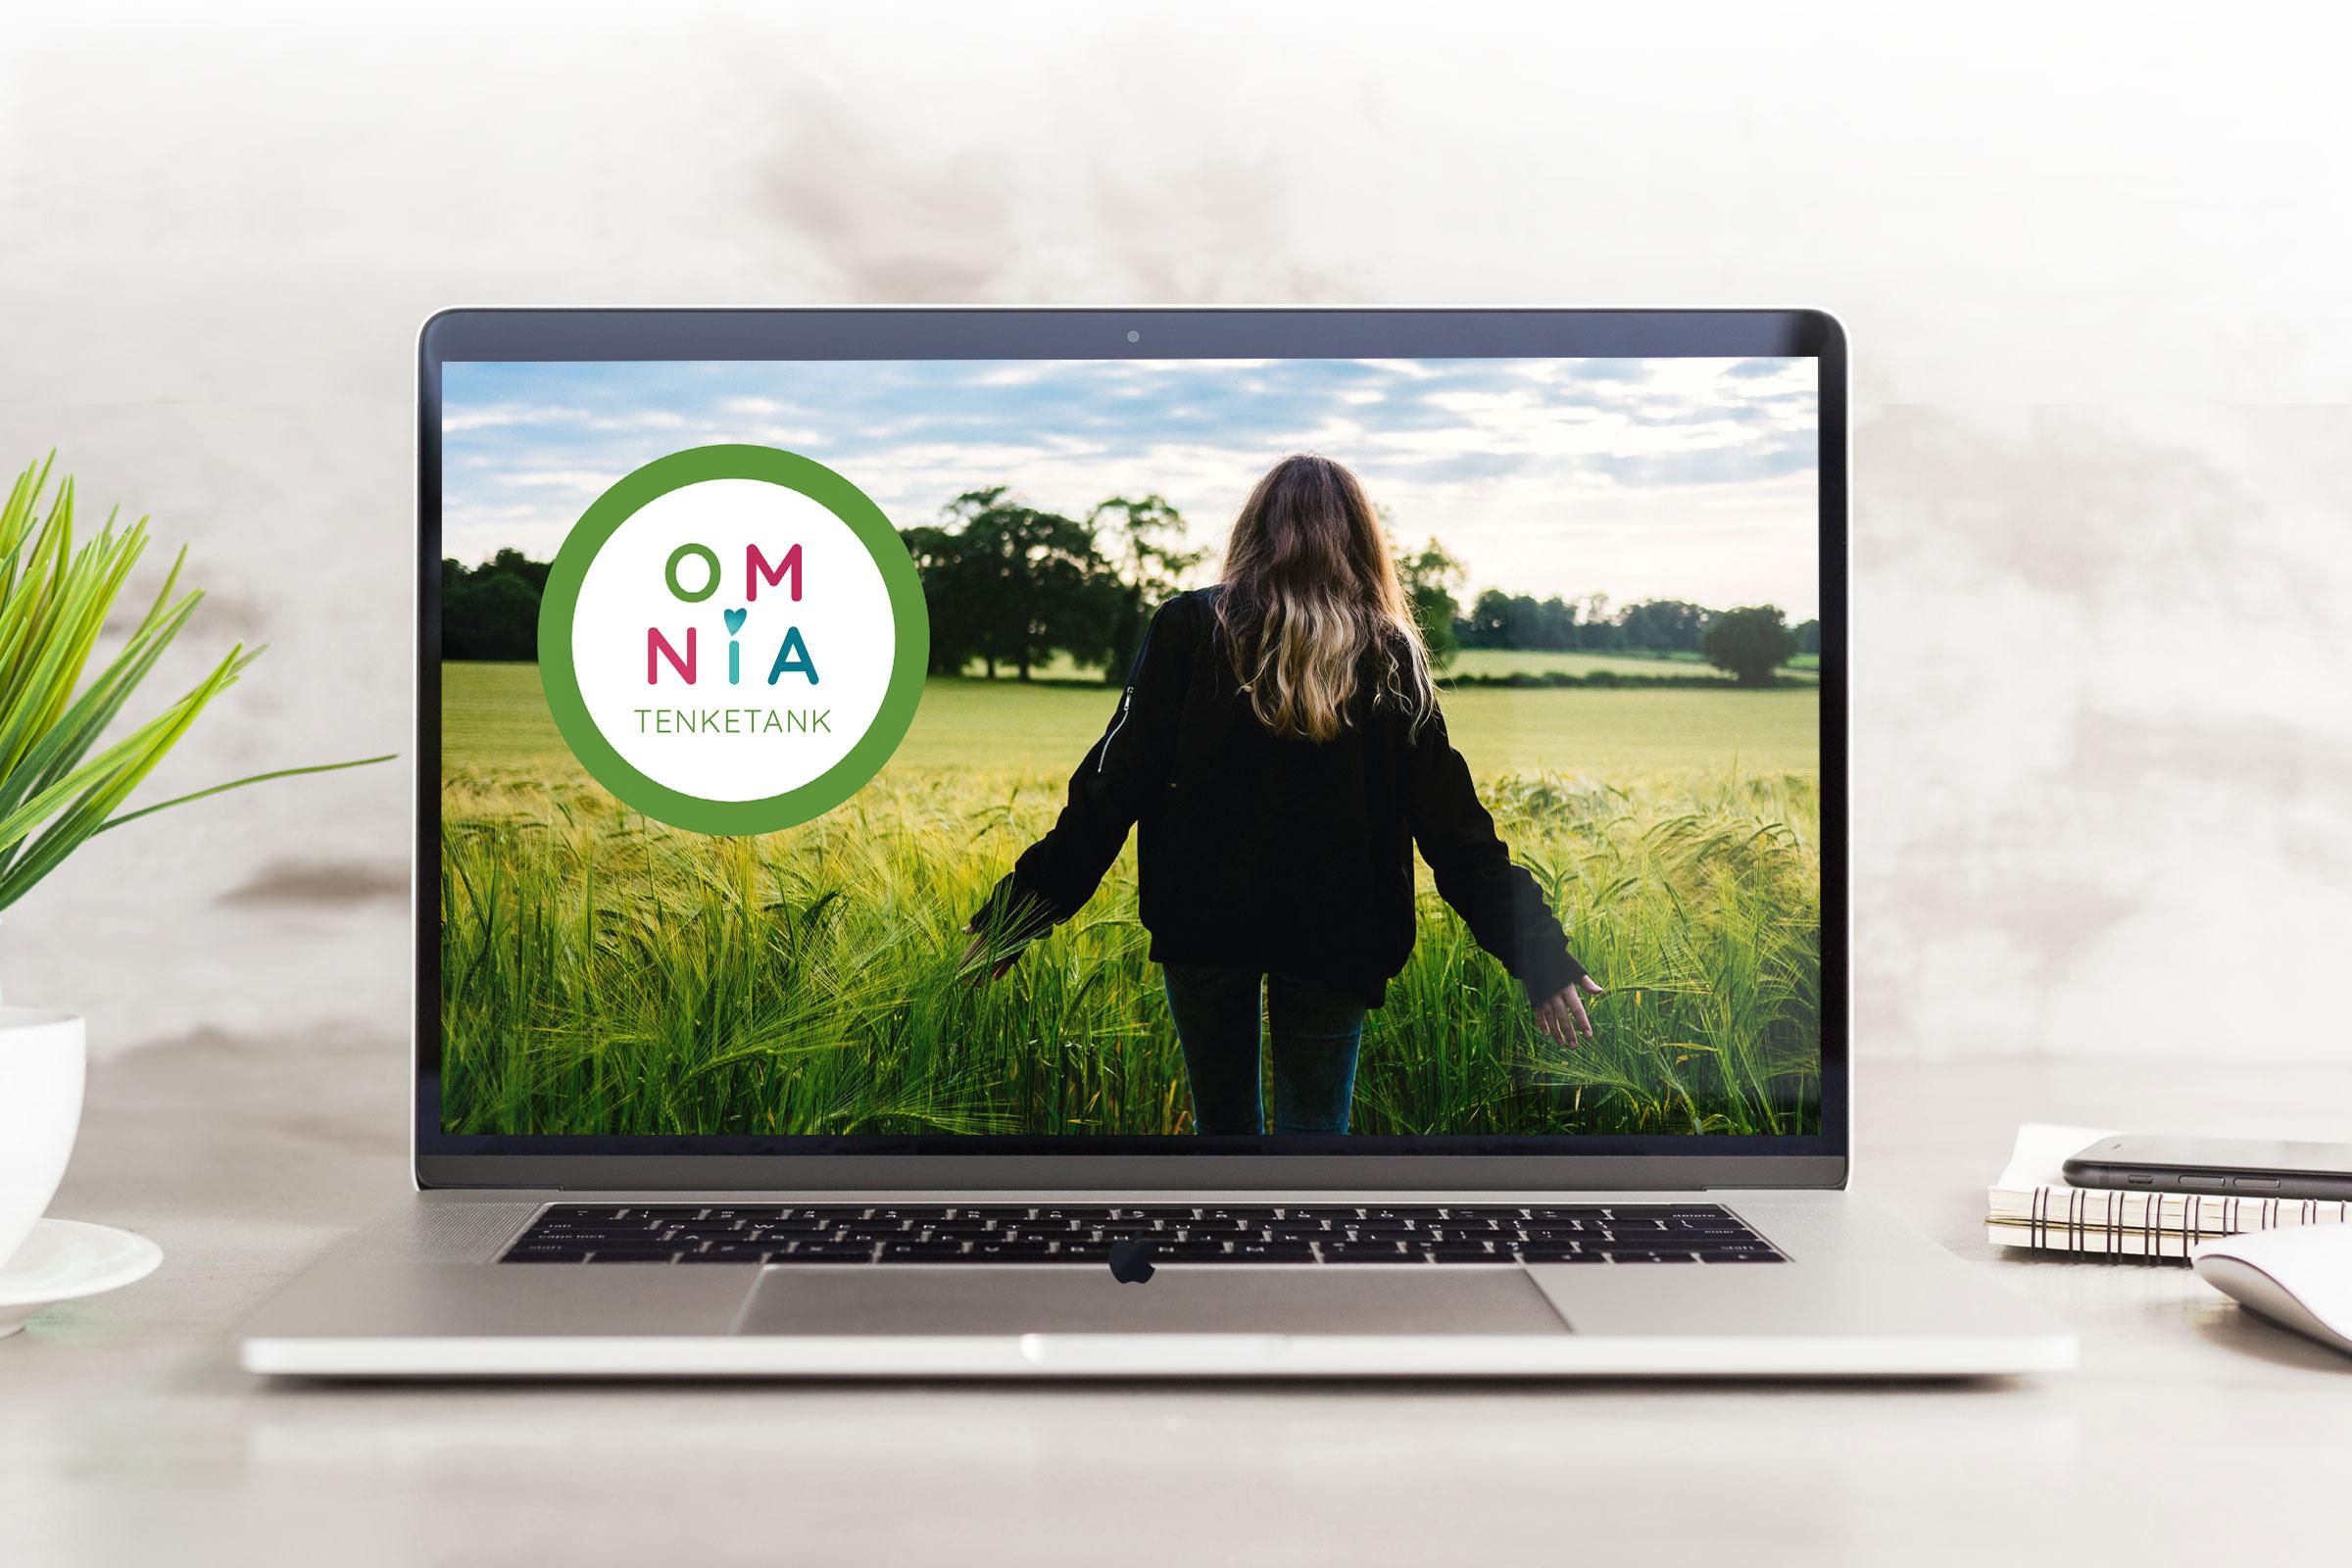 OmniaTenketank_1